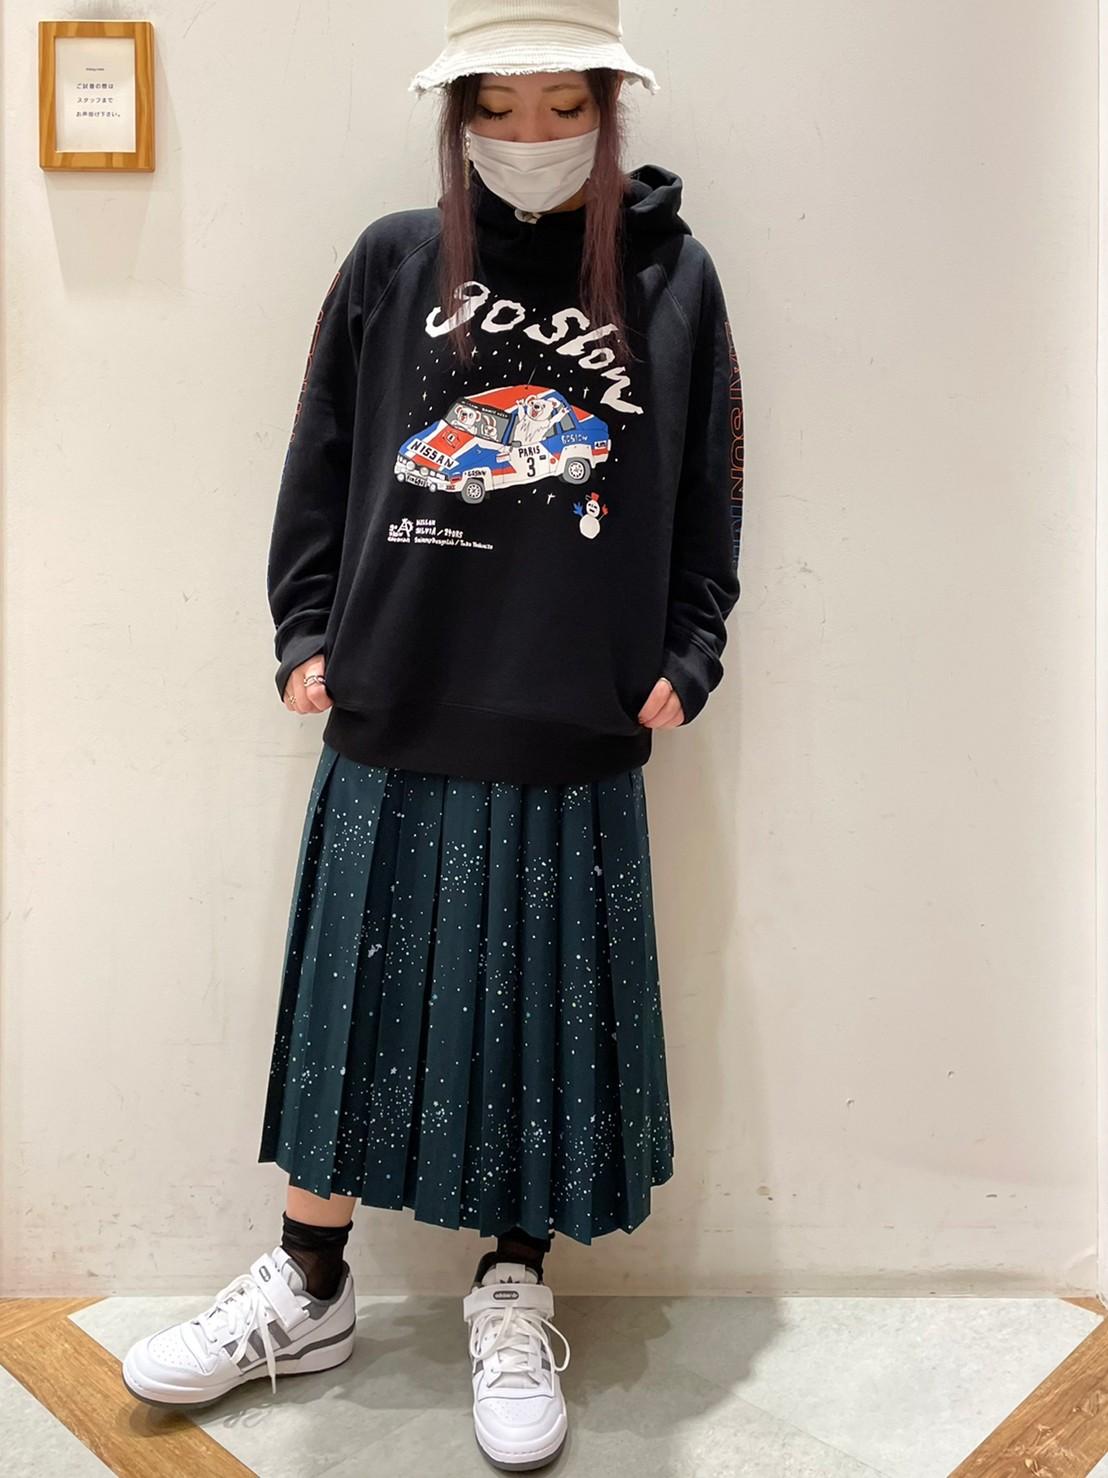 LINE_ALBUM_10.15あみブログ_211013_9